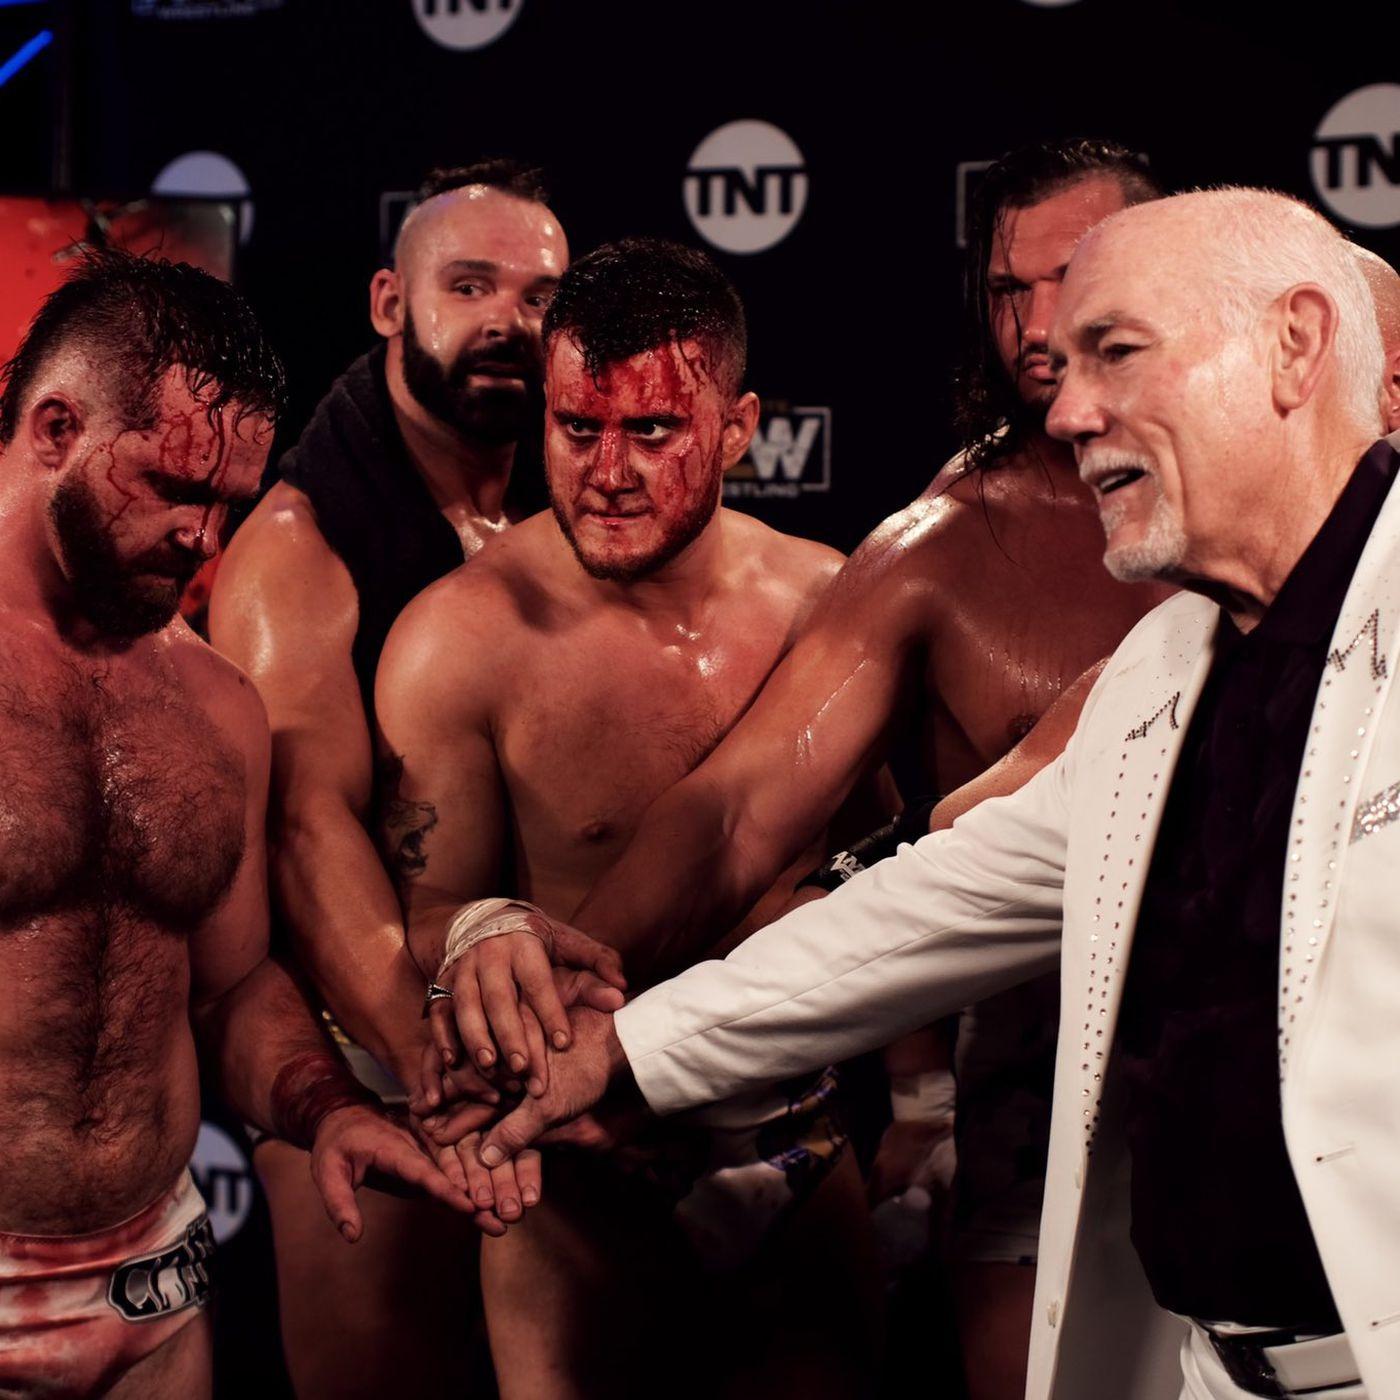 Wrestling Geeks Alliance - AEW Blood & Guts, Brian Pillman and More